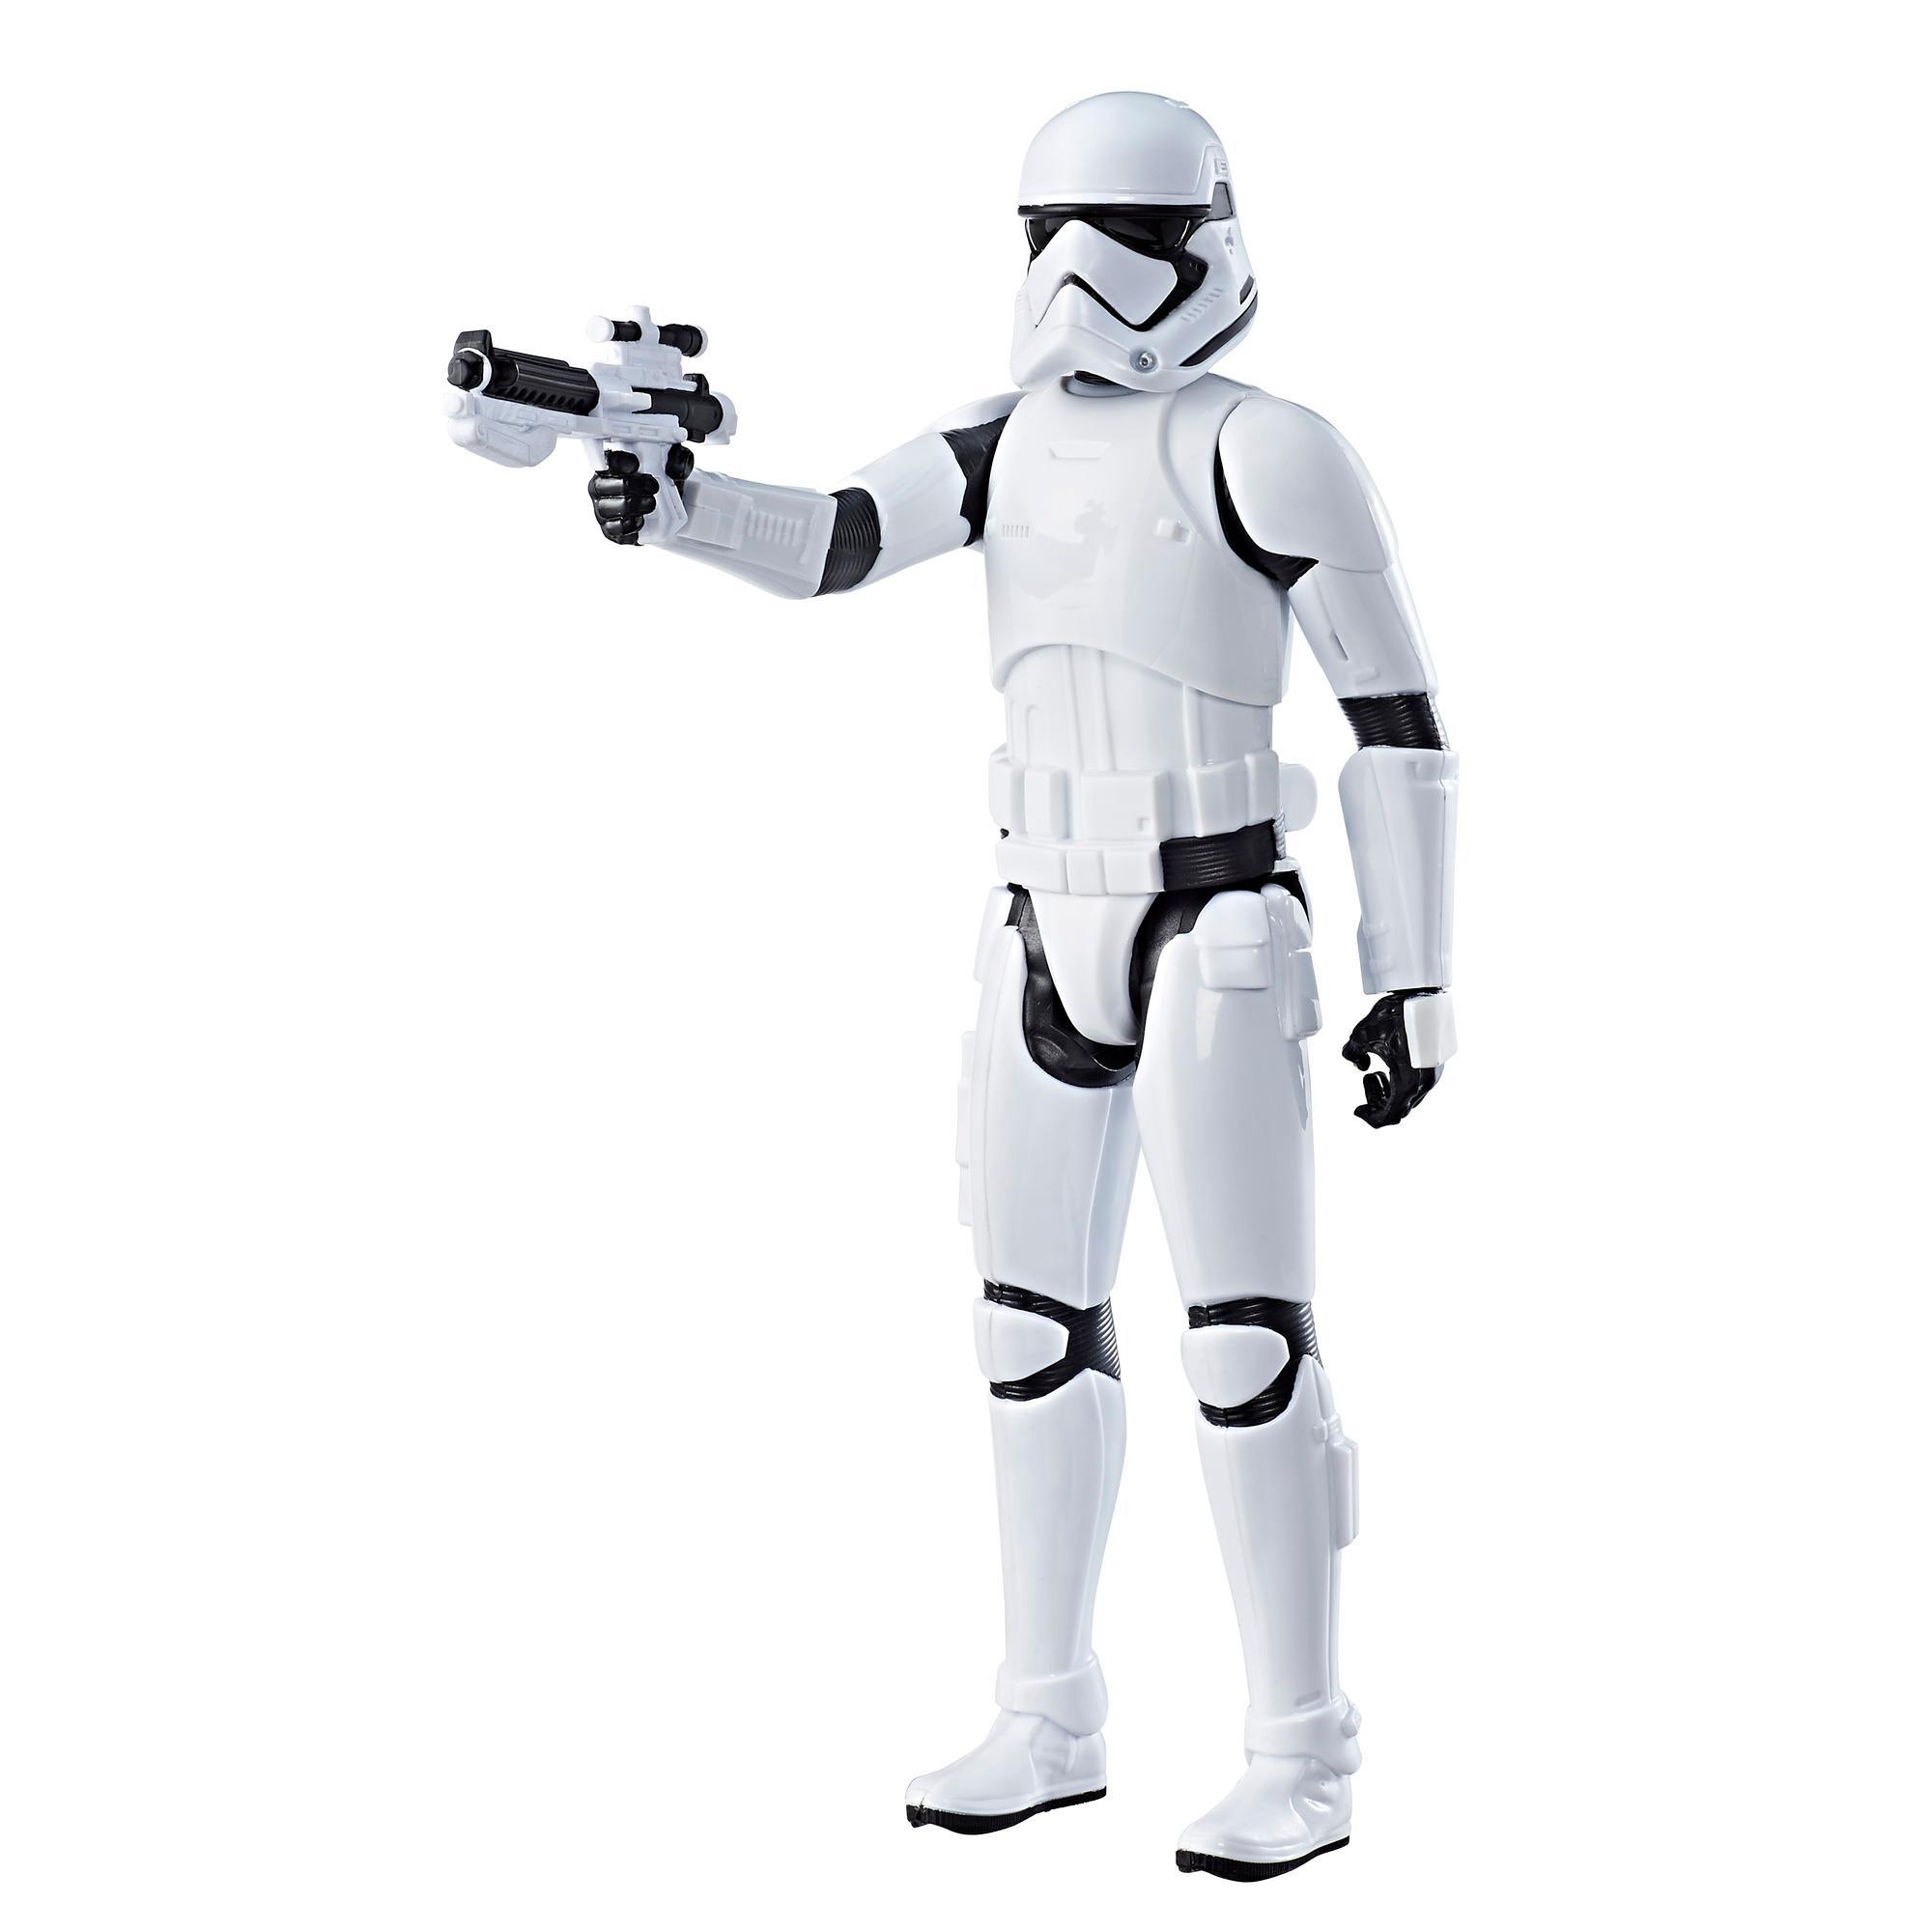 Star Wars: Os Últimos Jedi - Figura Stormtrooper da Primeira Ordem